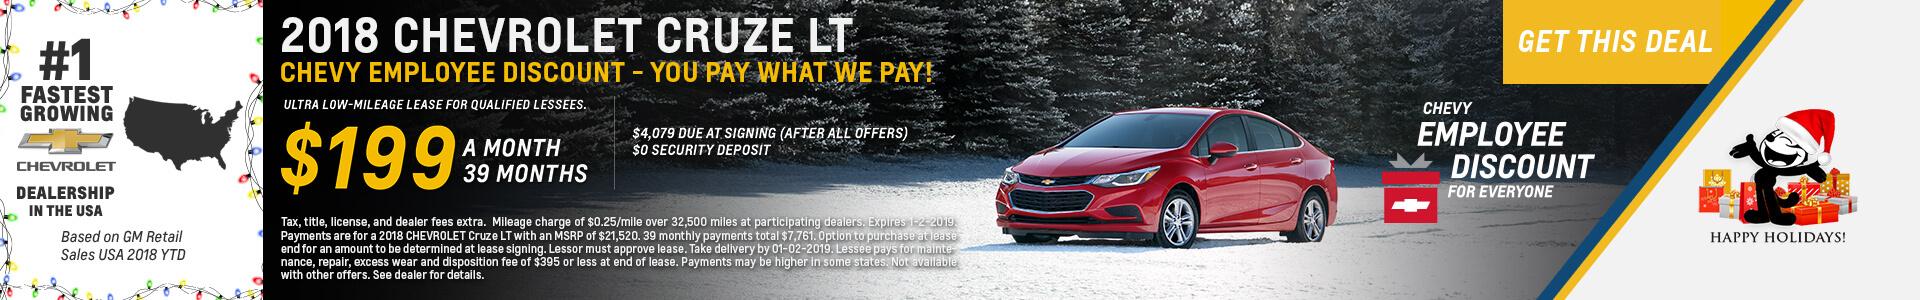 Chevrolet Cruze $199 Lease